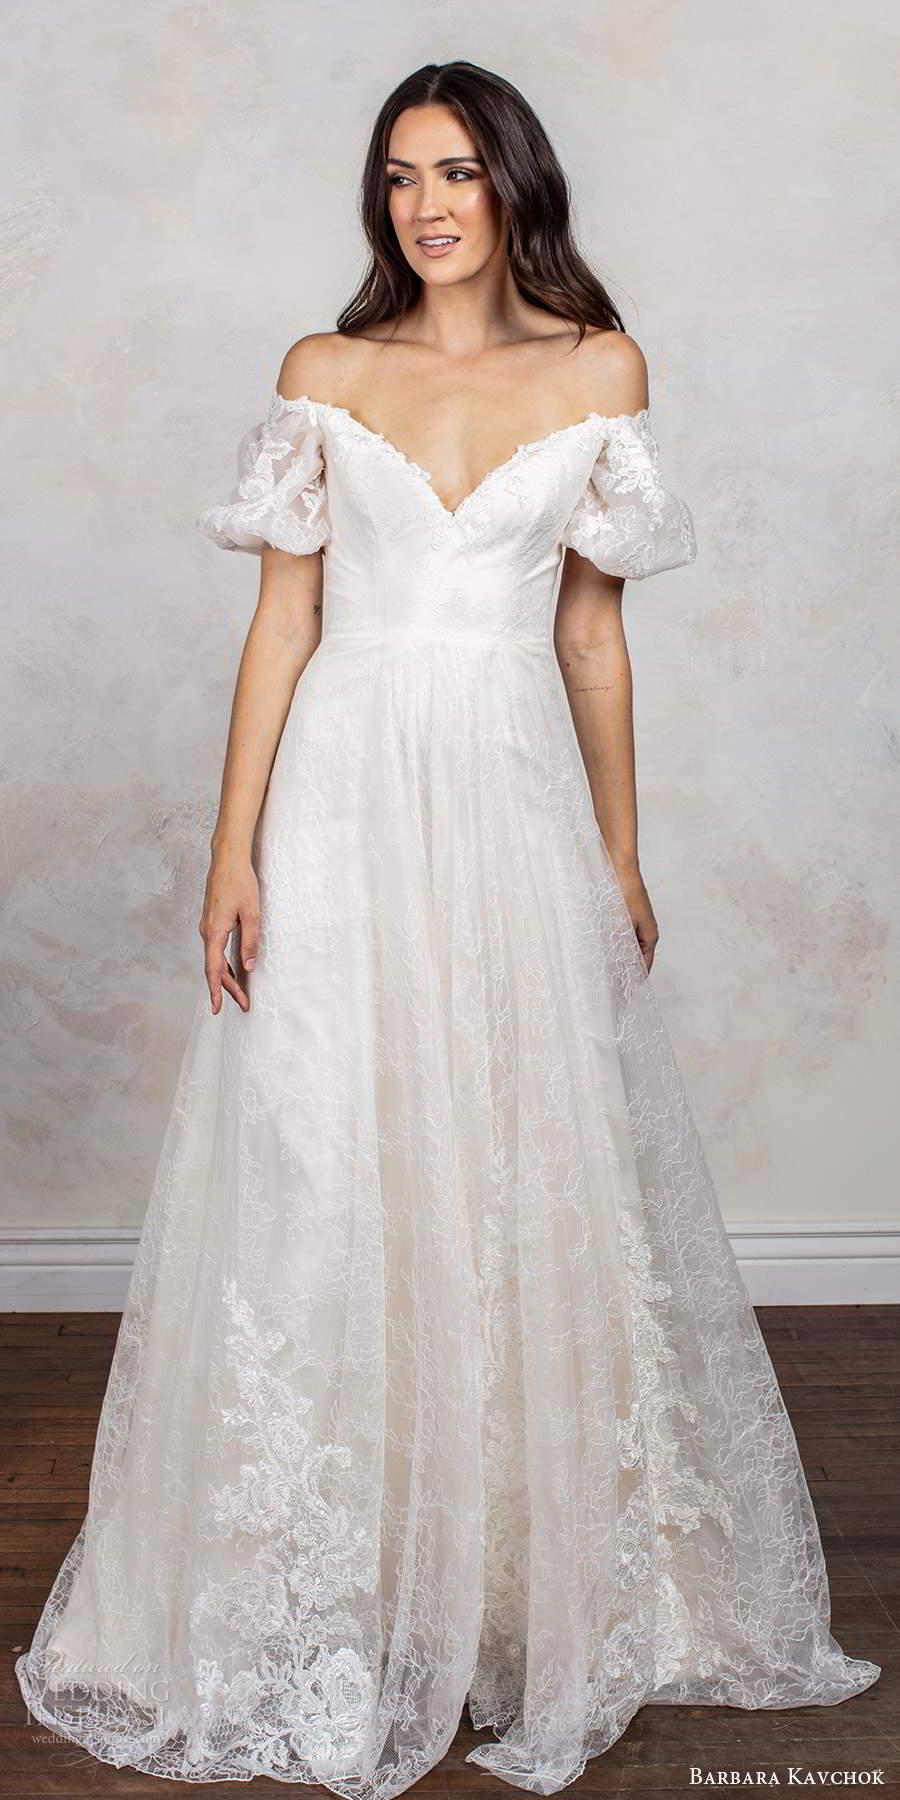 barbara kavchok fall 2020 bridal short puff sleeves off shoulder sweetheart neckline fully embellished lace a line ball gown wedding dress scoop back chapel train (1) mv